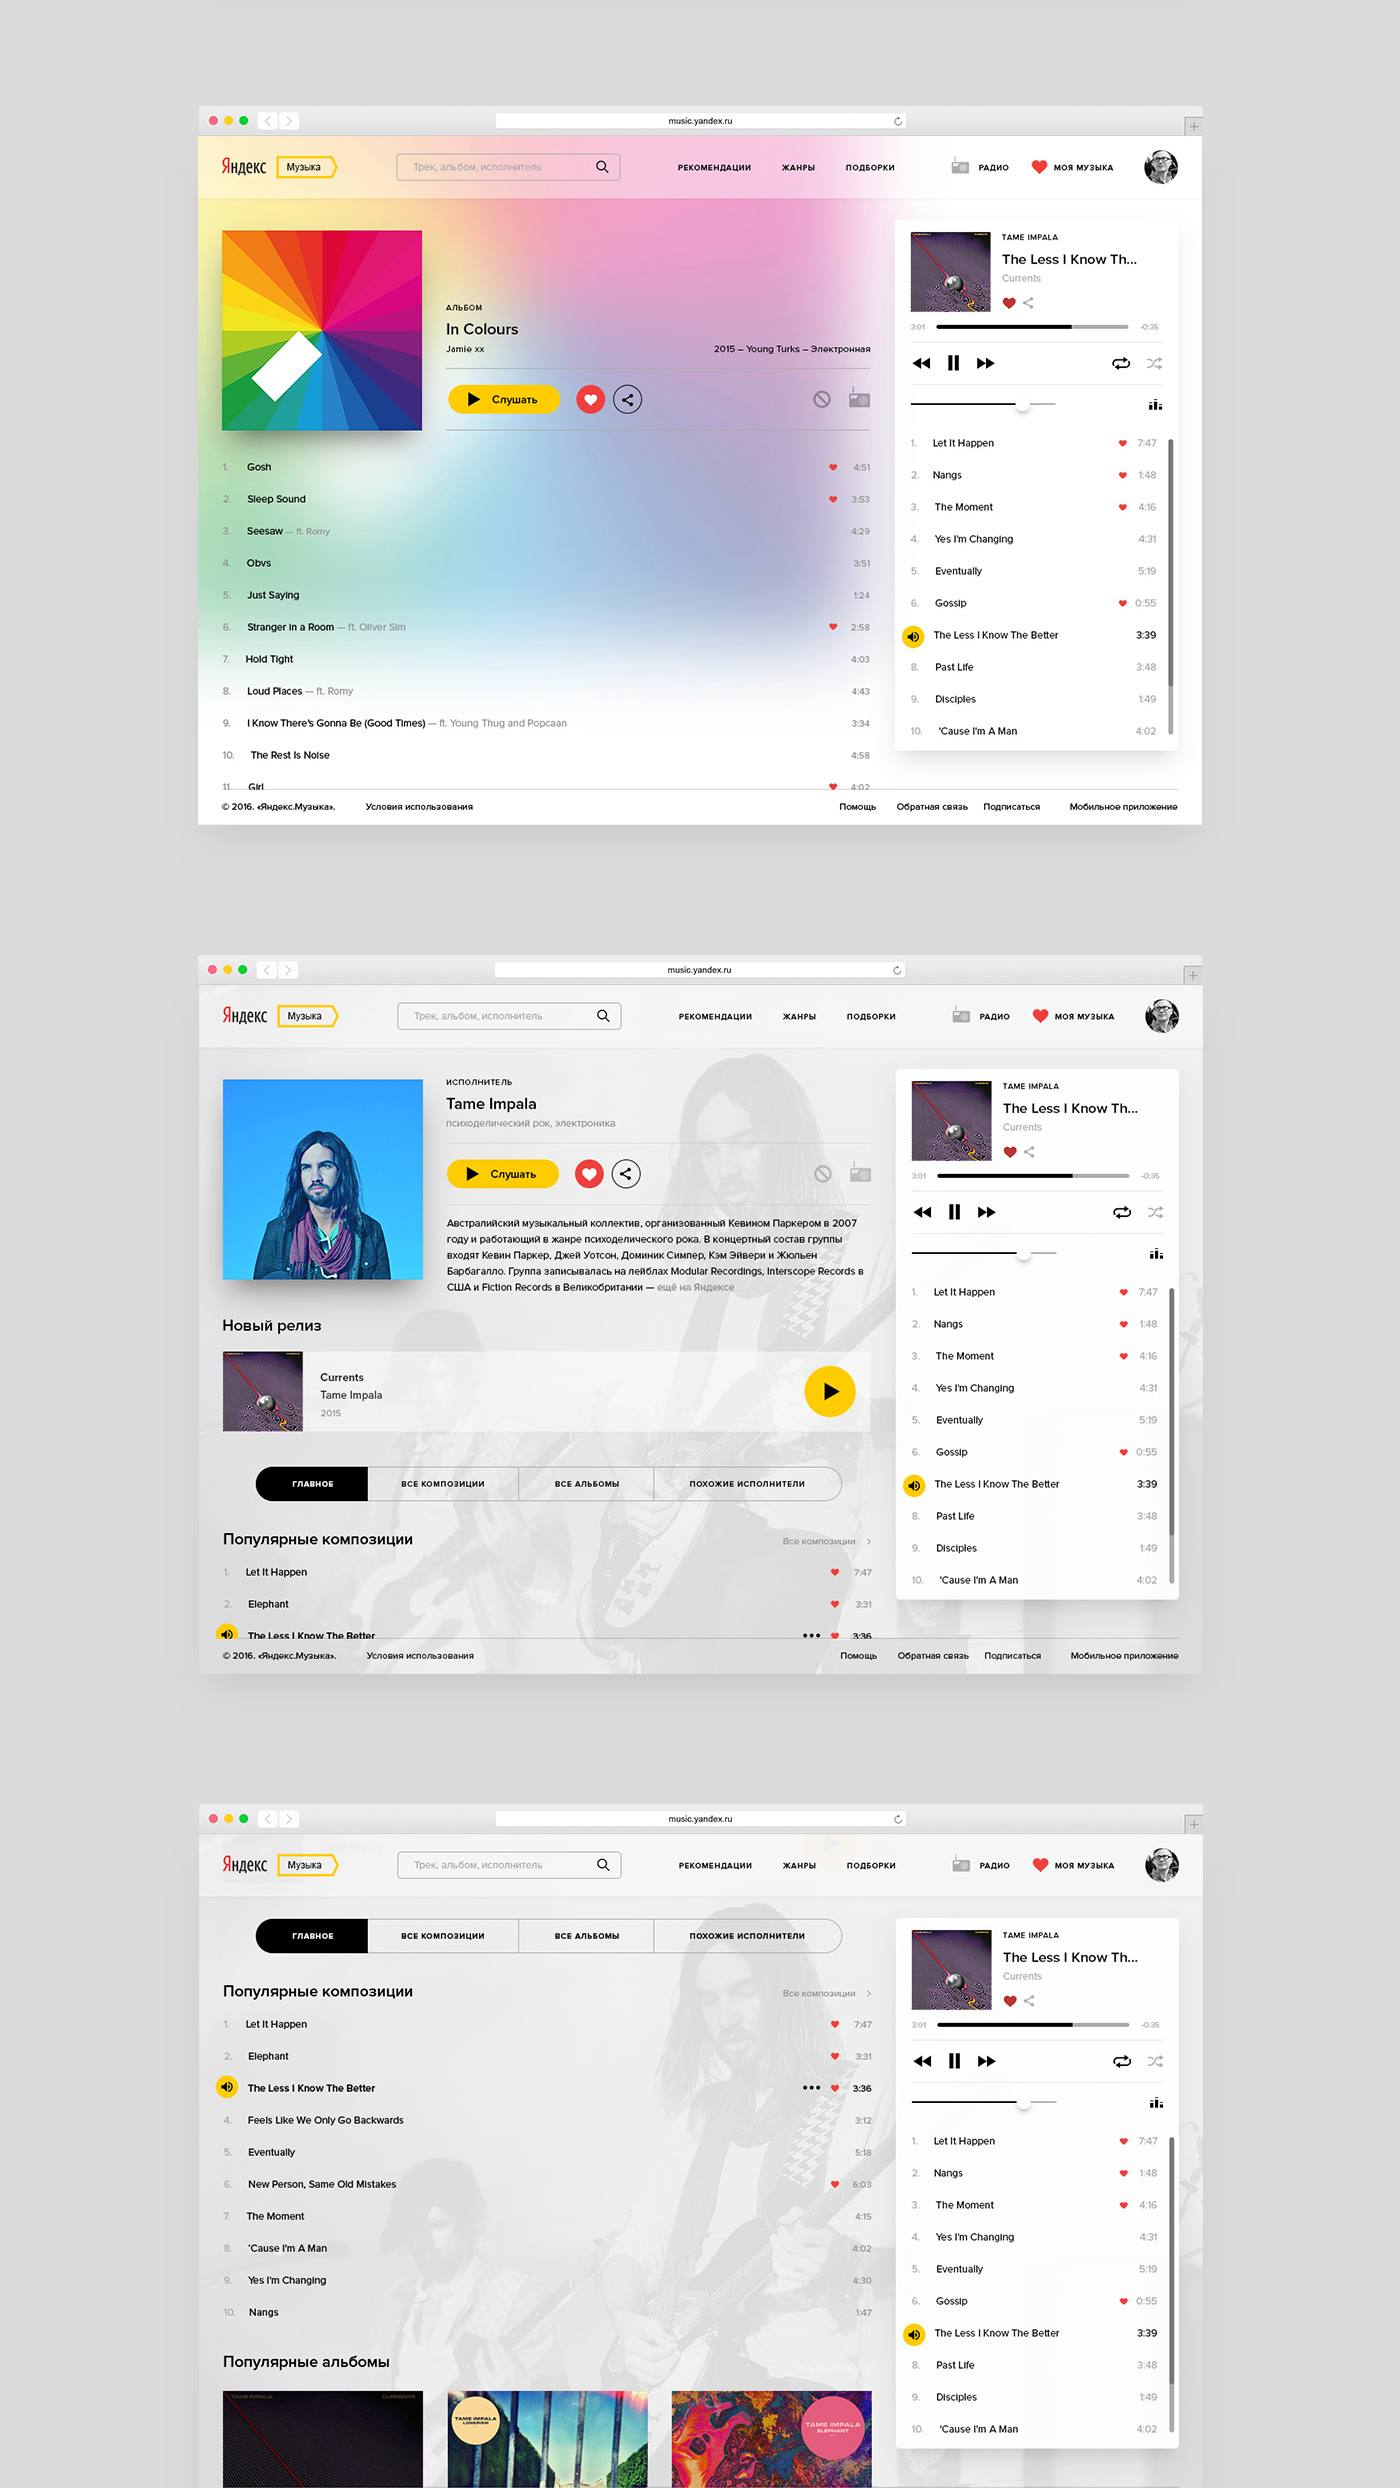 yandex online music Streaming stream Yandex Music UI Tame Impala lonerism